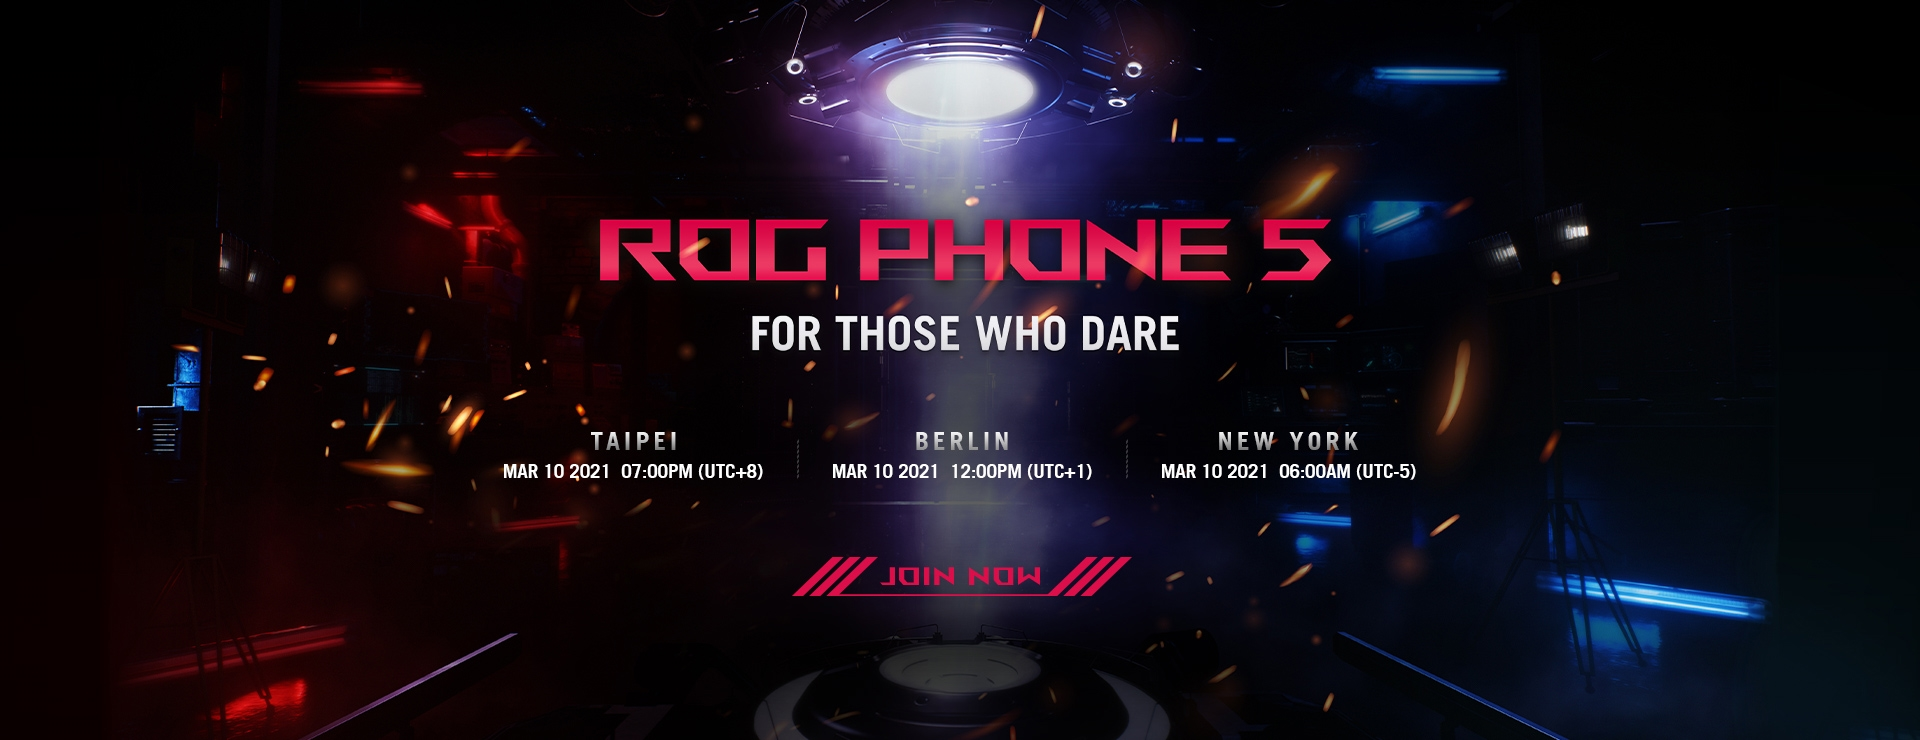 210222-0314 ROG Phone 5